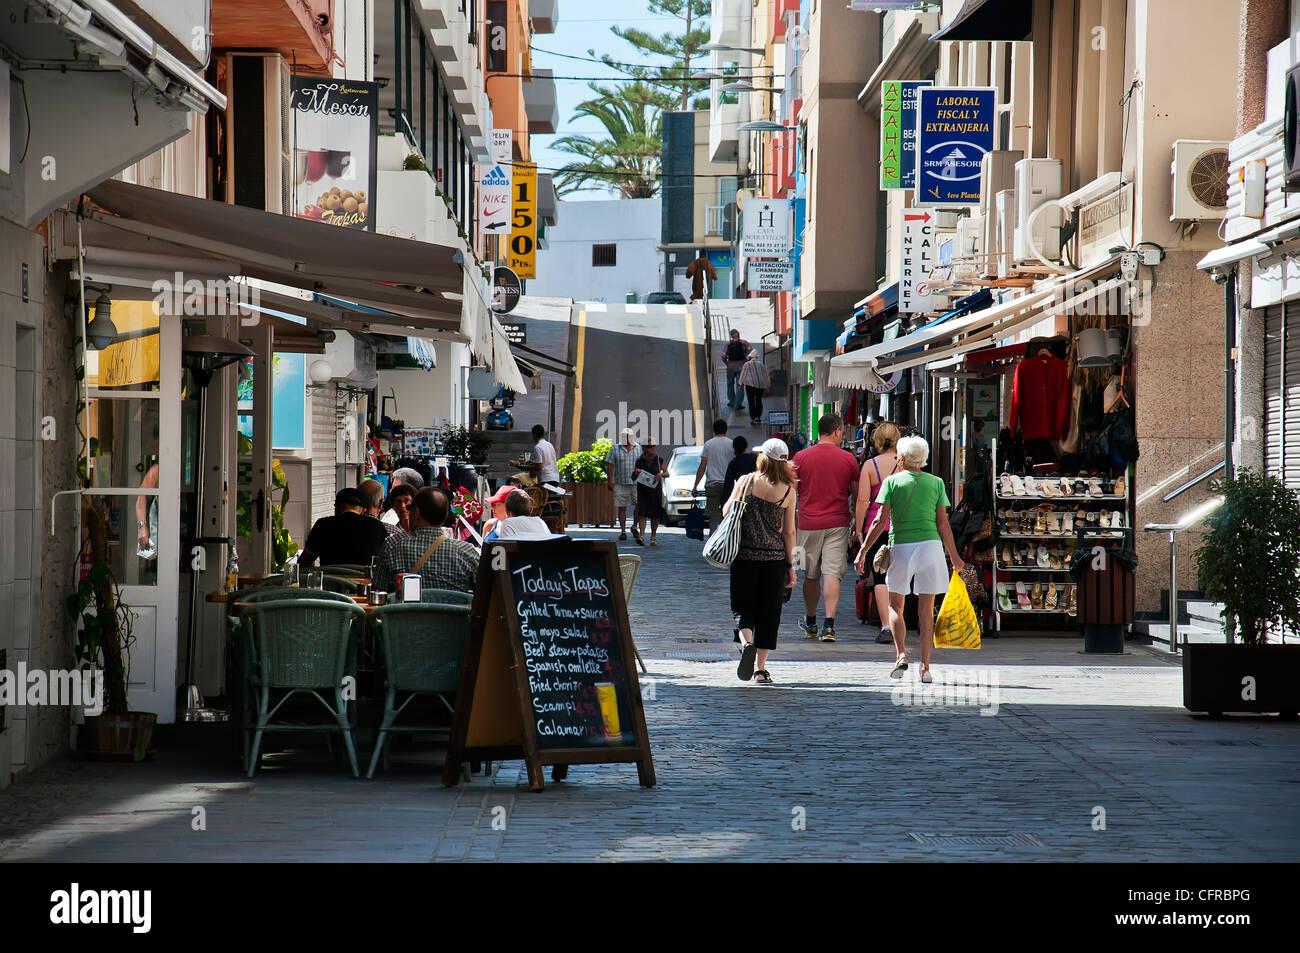 Los Cristianos Village Street, Calle Juan 23, Tenerife Spain. - Stock Image